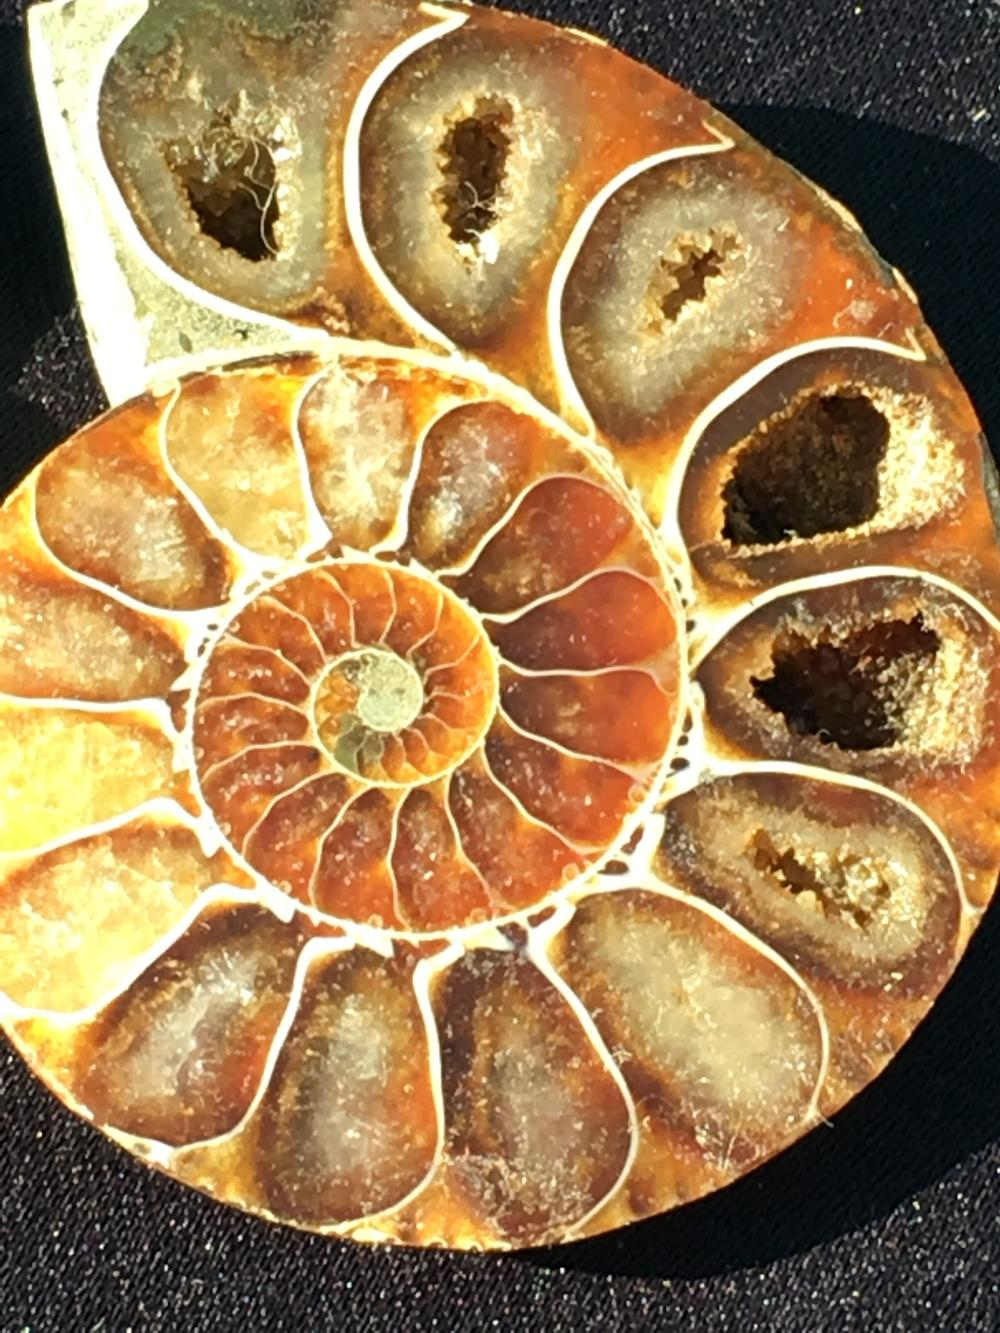 Lot 75: Ammonite, Fossil, Rock, Natural, Specimen, Décor, Collectible